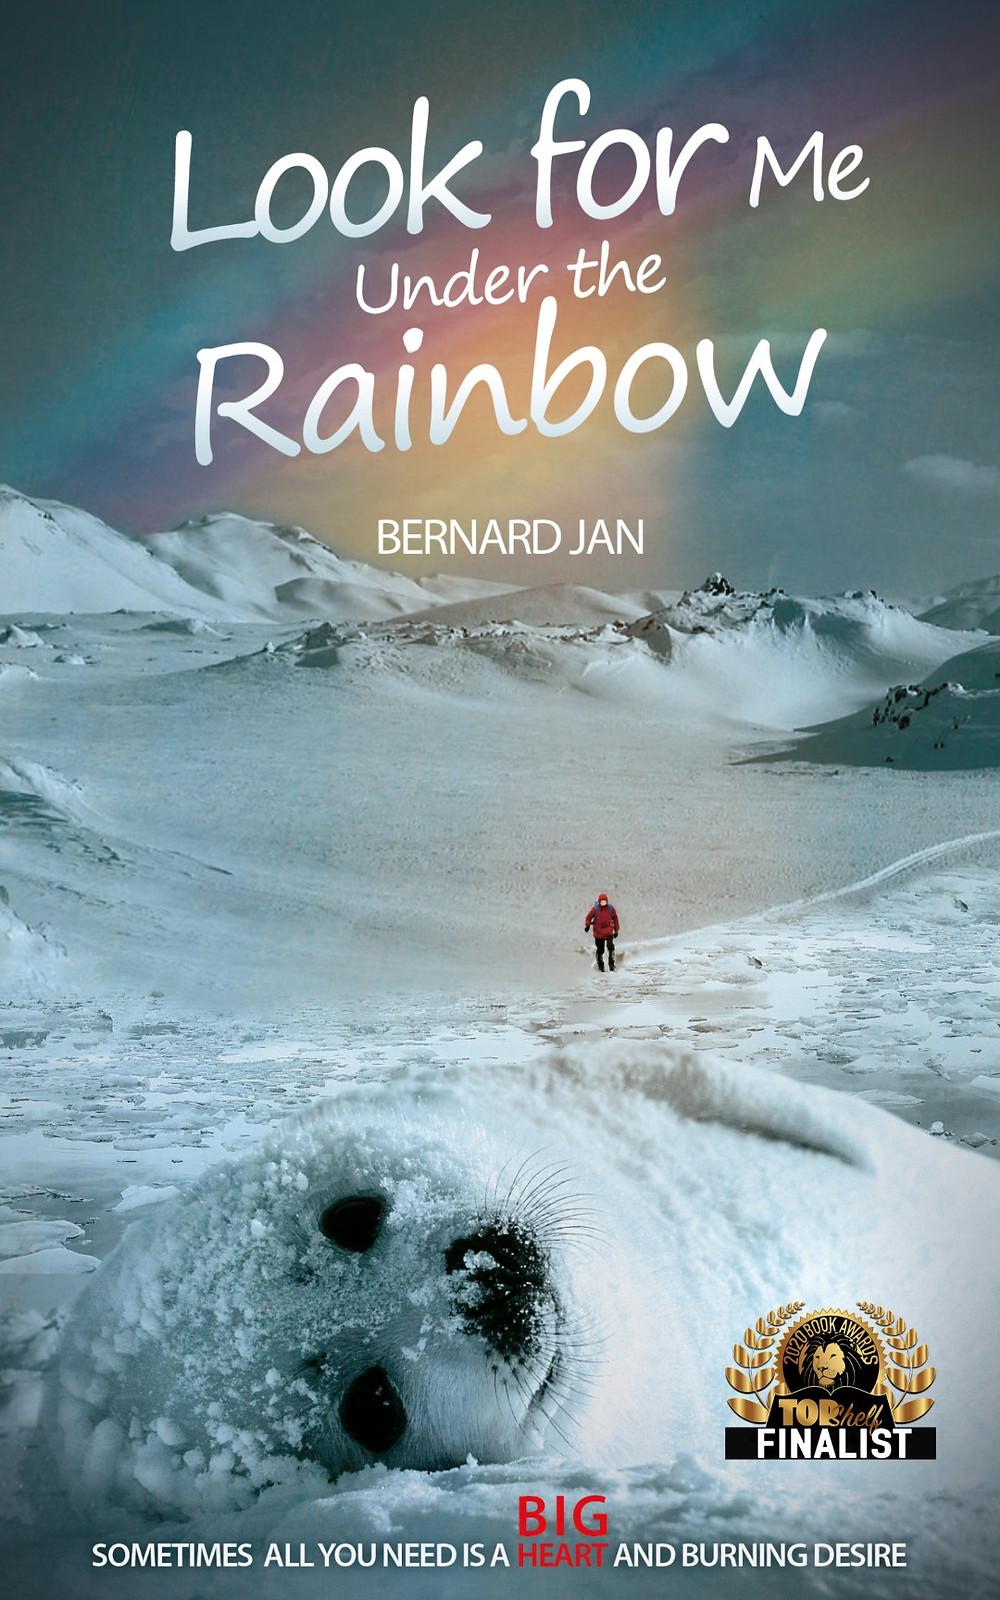 Look for Me Under the Rainbow by Bernard Jan TopShelf 2020 Book Awards Finalist